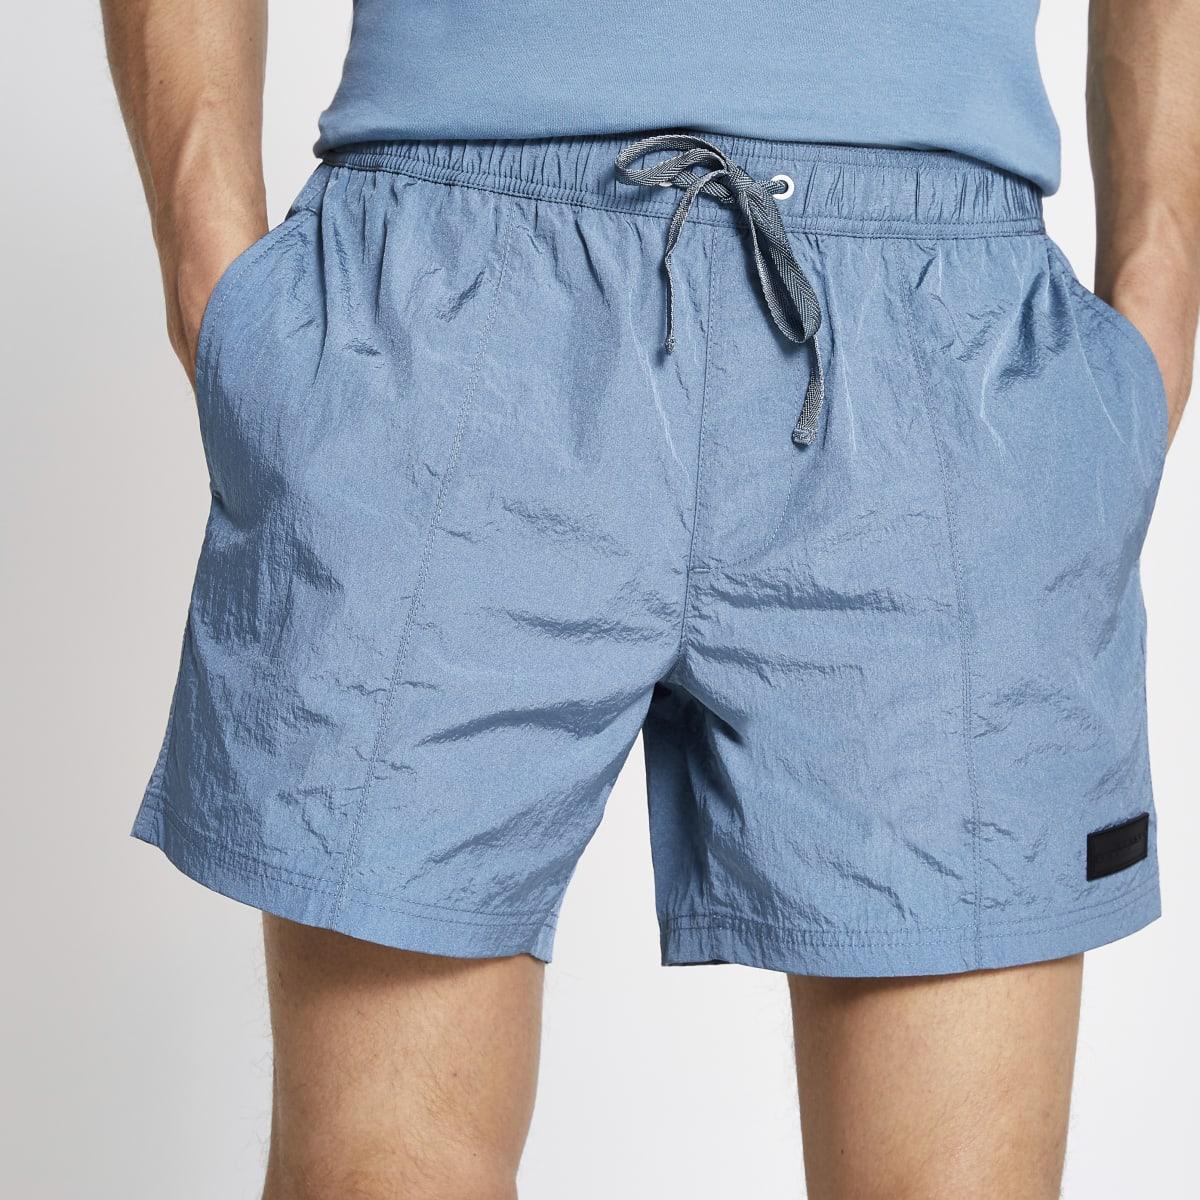 Pastel Tech blue drawstring swim shorts